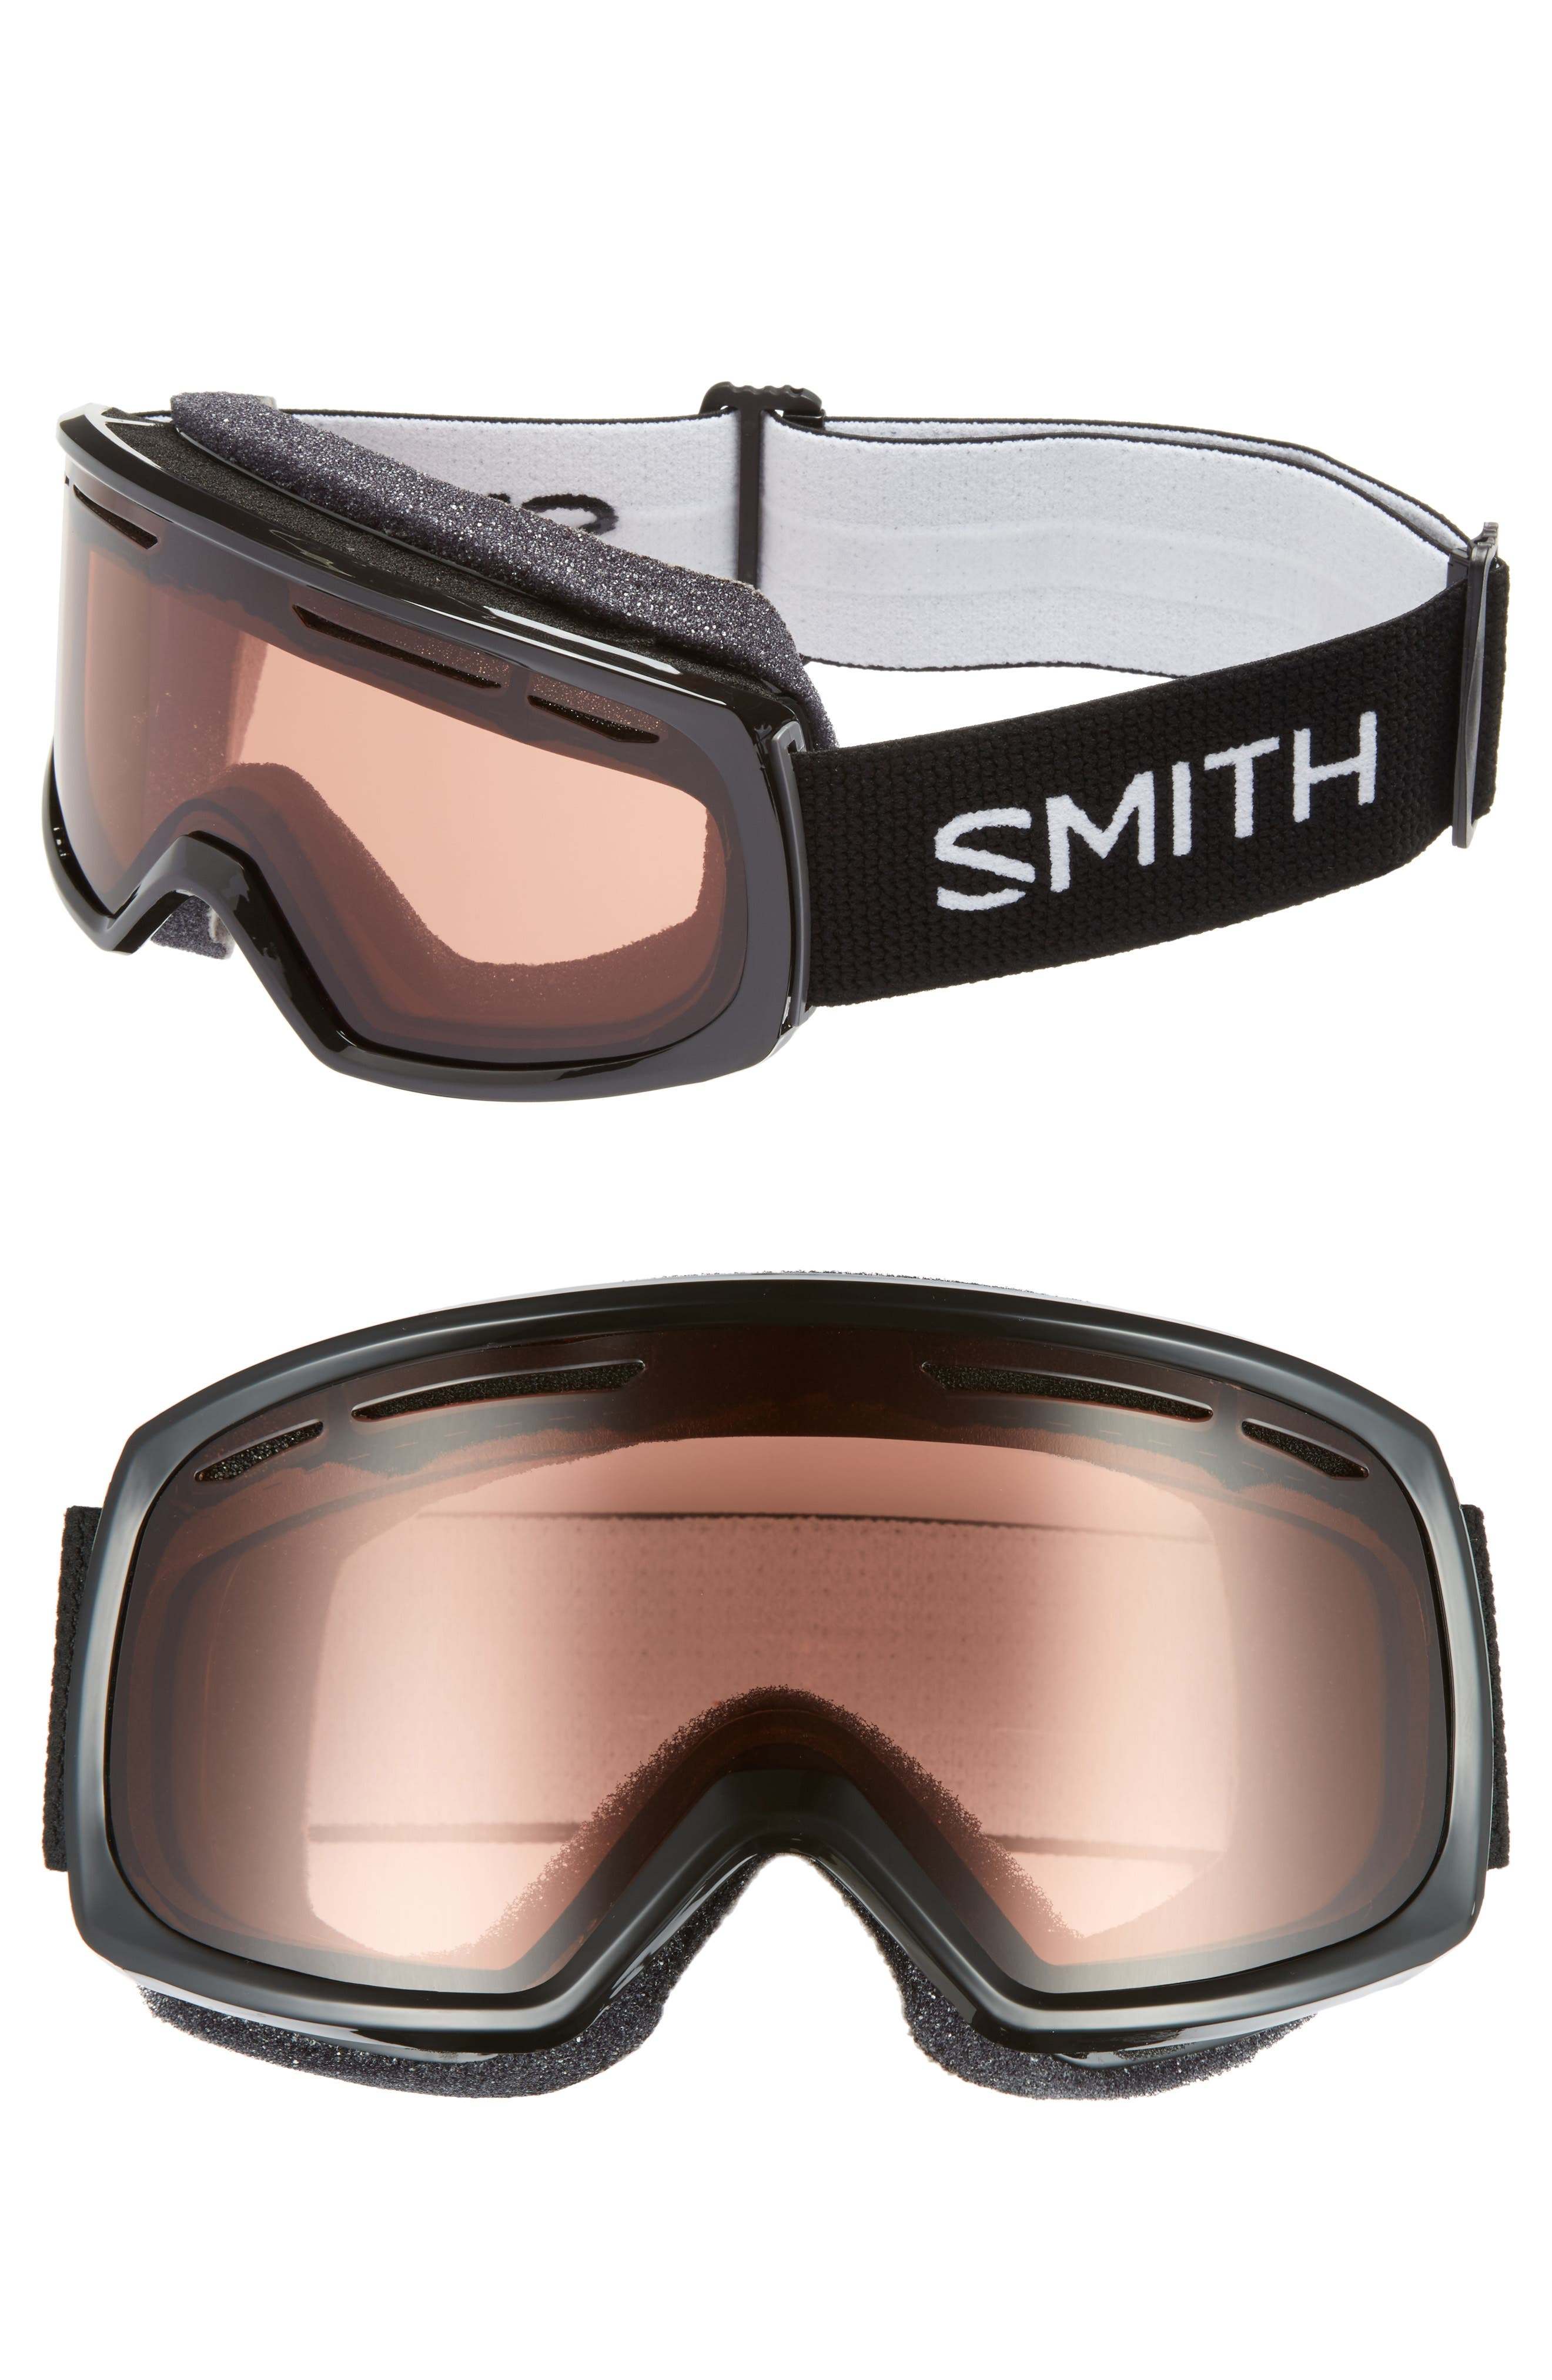 Drift 180mm Snow Goggles,                             Main thumbnail 1, color,                             BLACK/ RC36